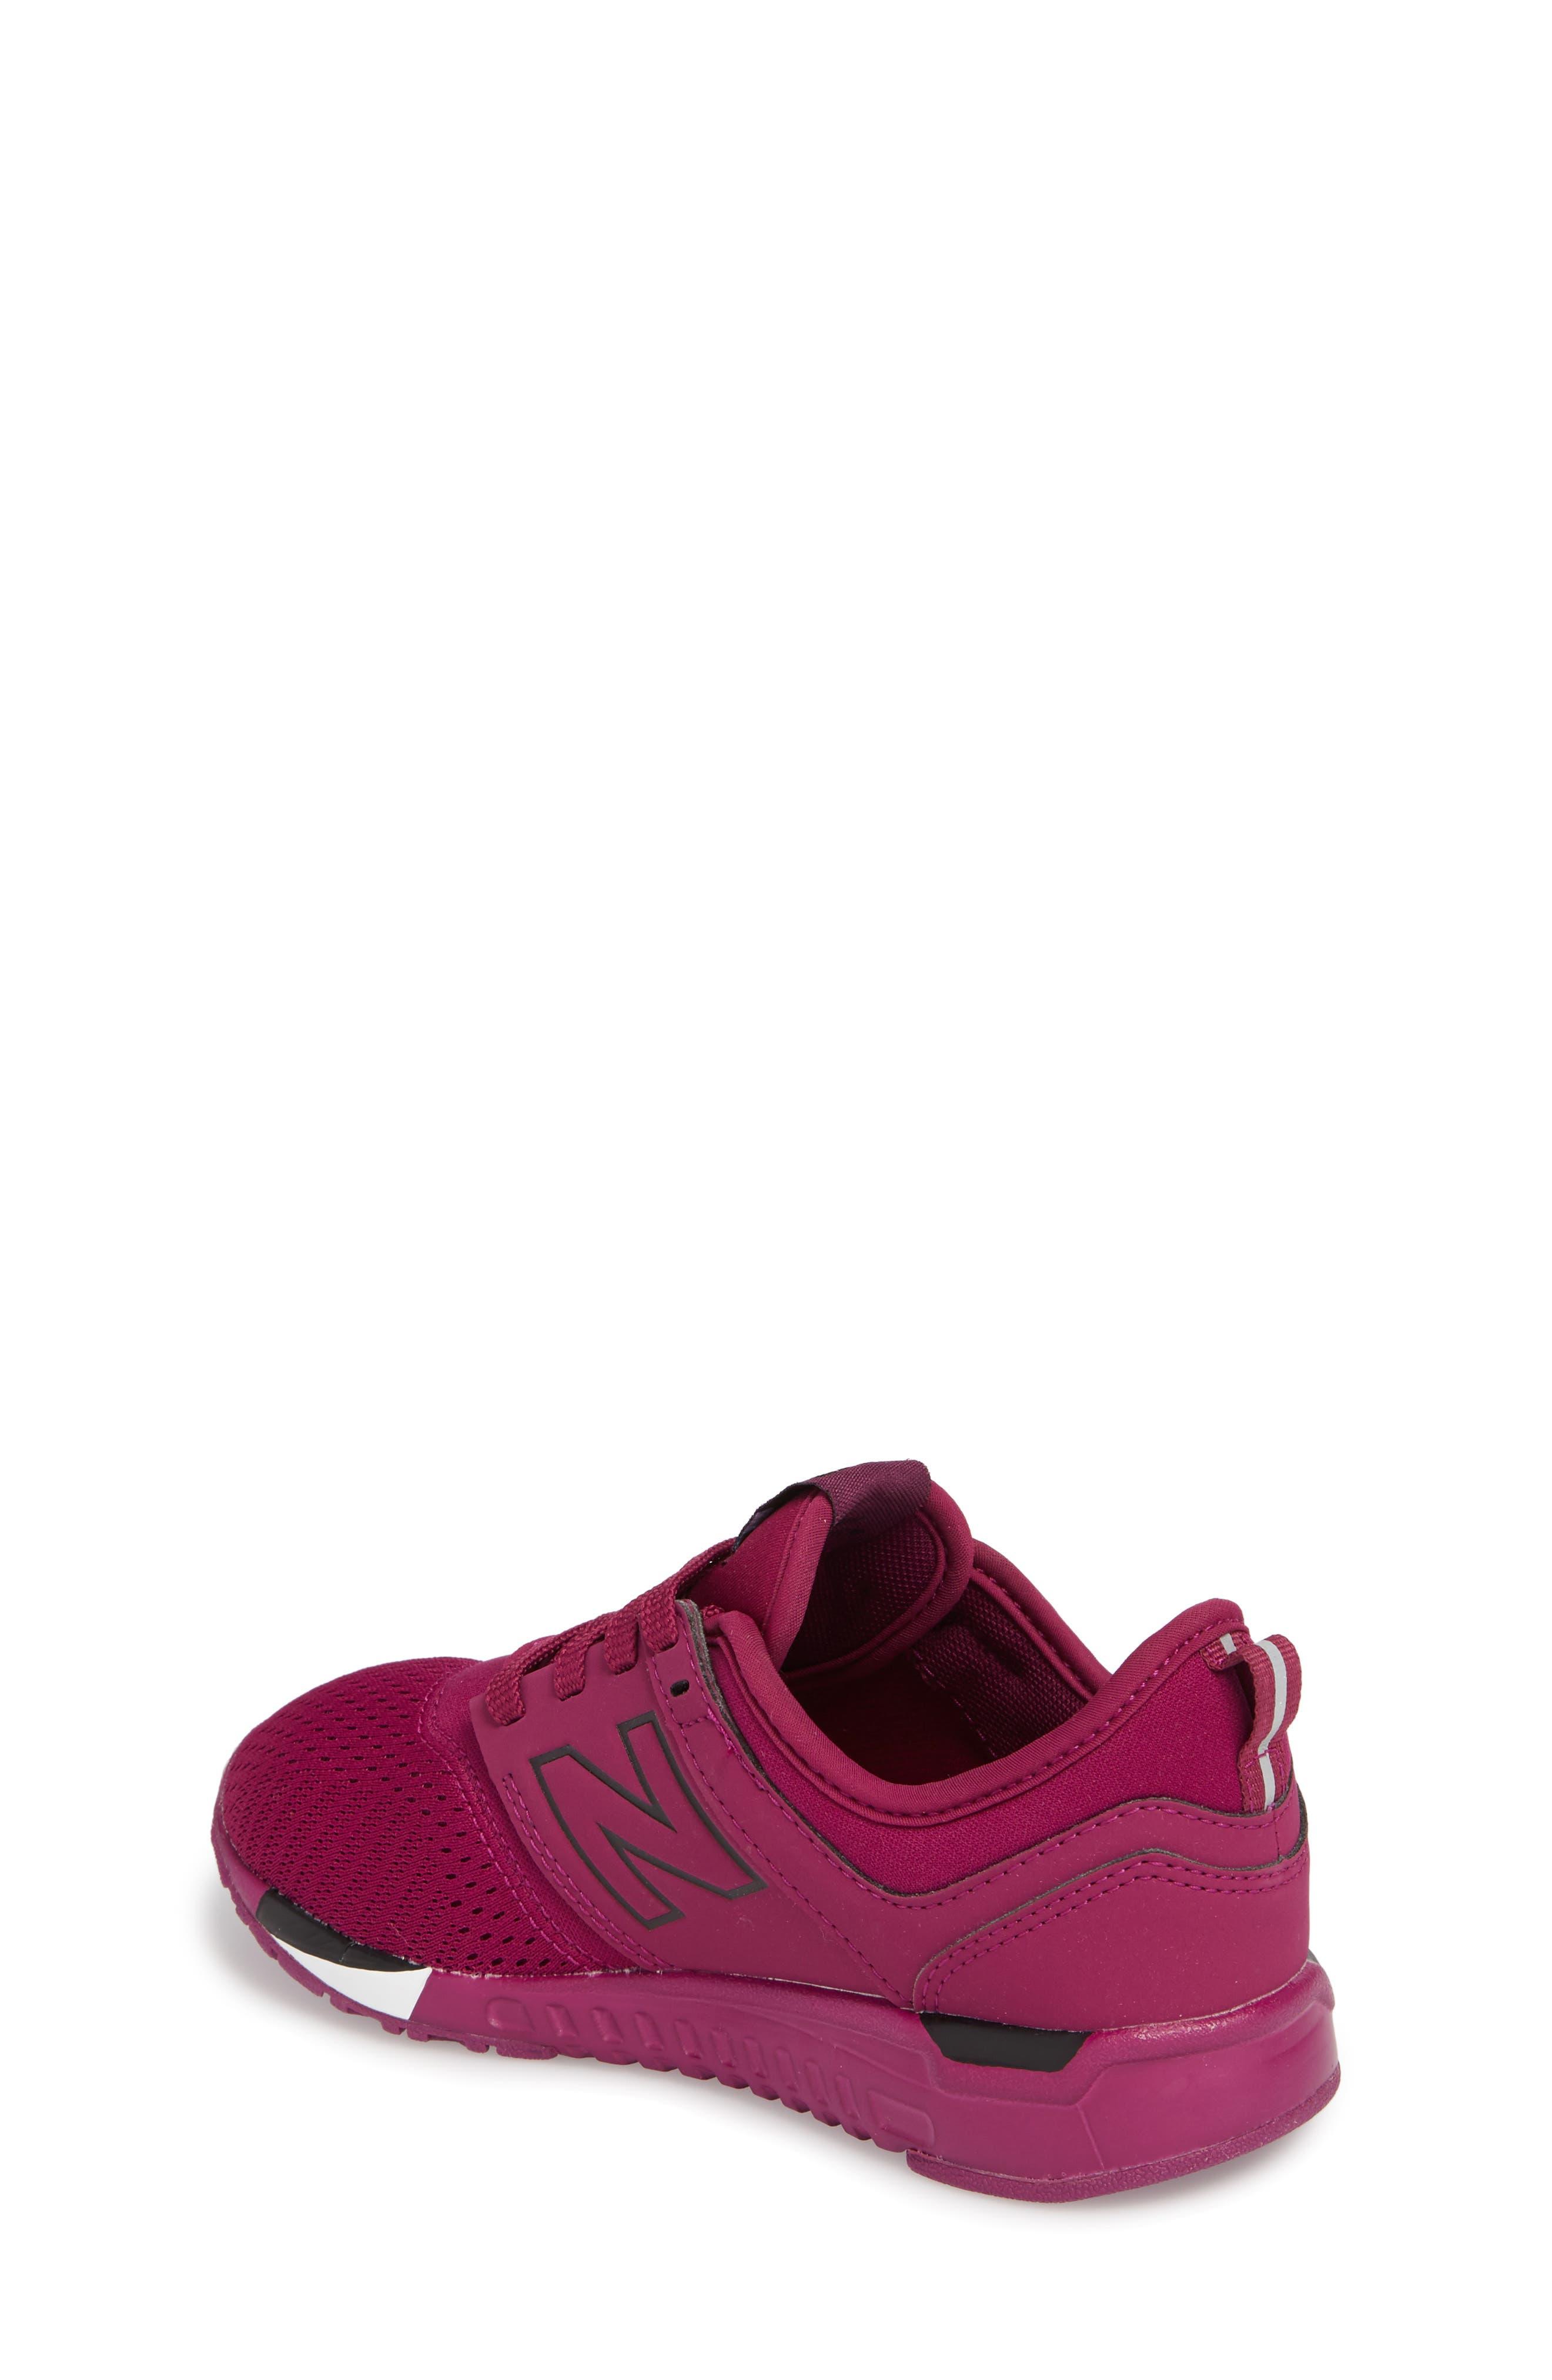 Alternate Image 2  - New Balance 247 Sport Sneaker (Baby, Walker, Toddler, Little Kid & Big Kid)